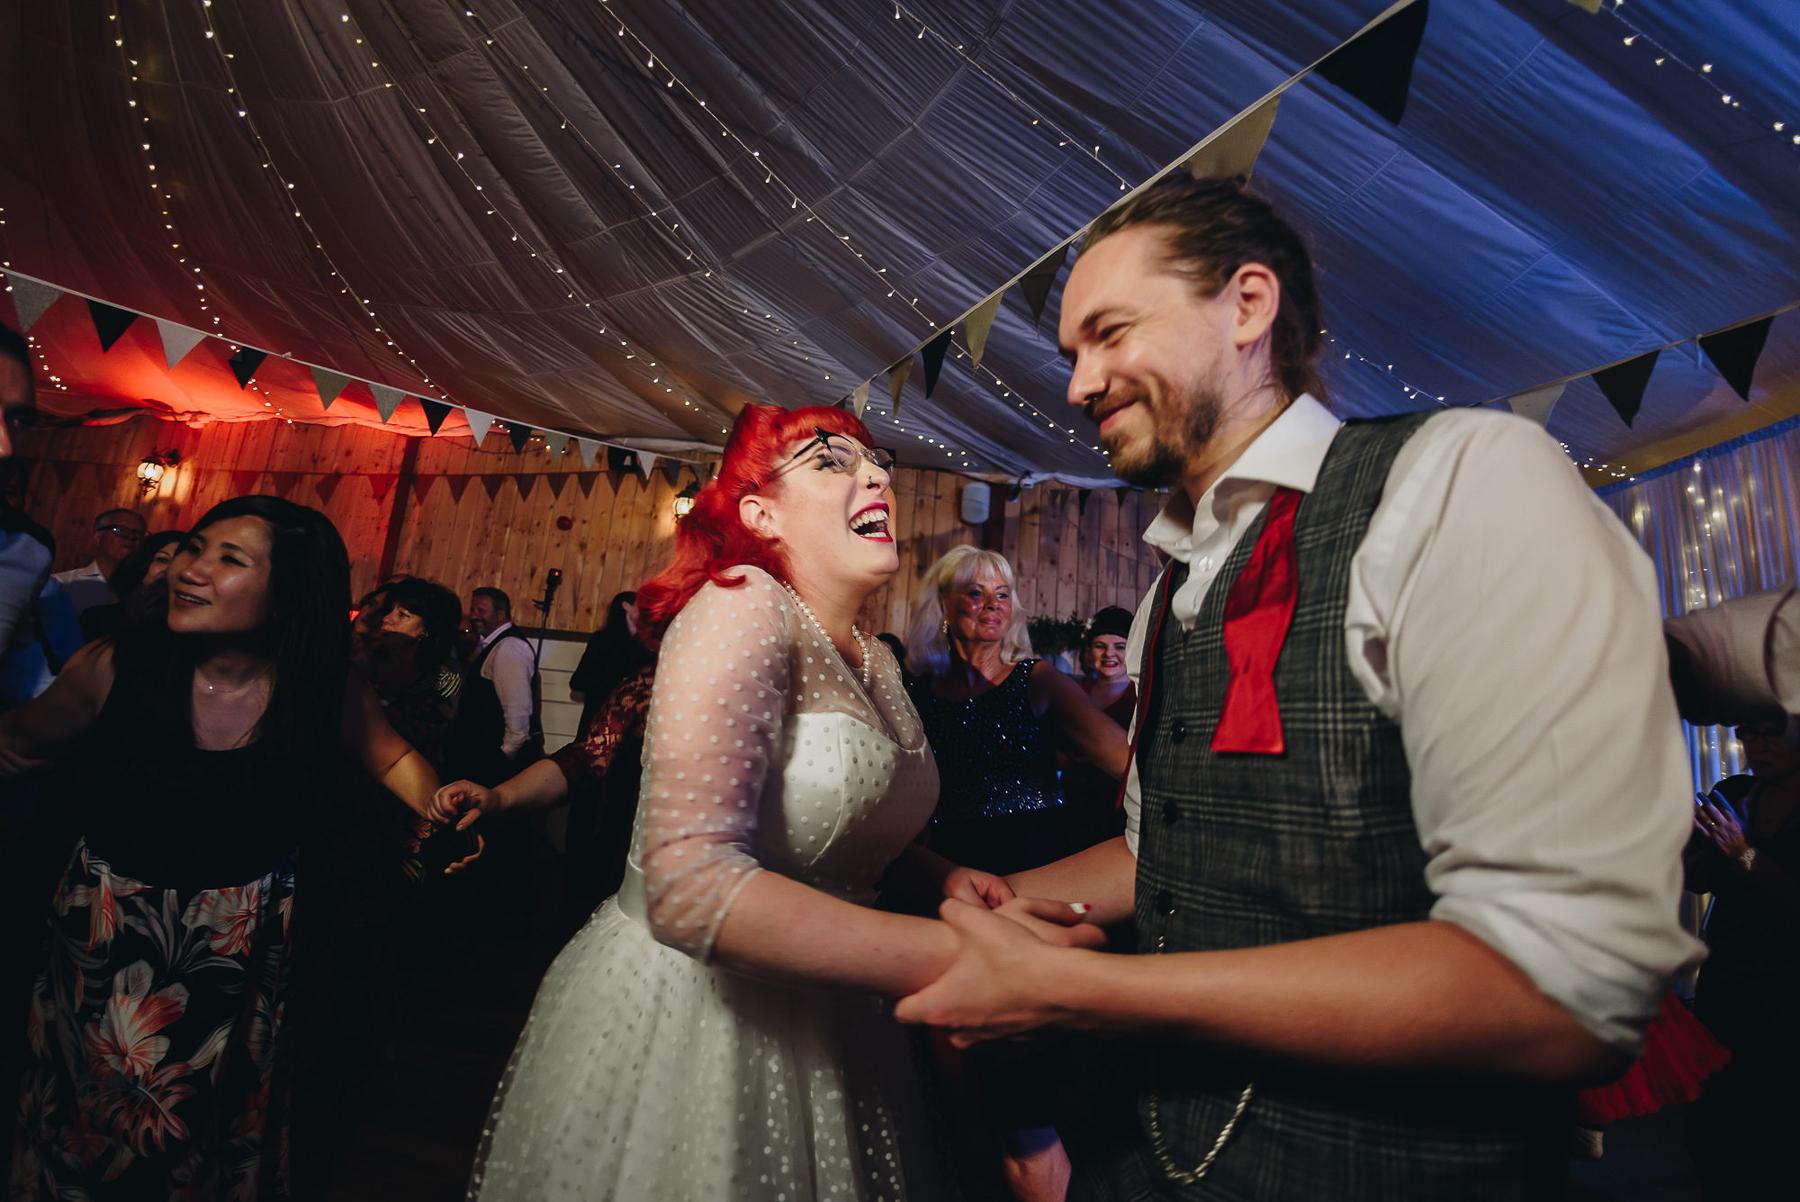 Wellbeing_Farm_Wedding_Photography_The_Pin-Up_Bride_Lara_Shaun-178.jpg